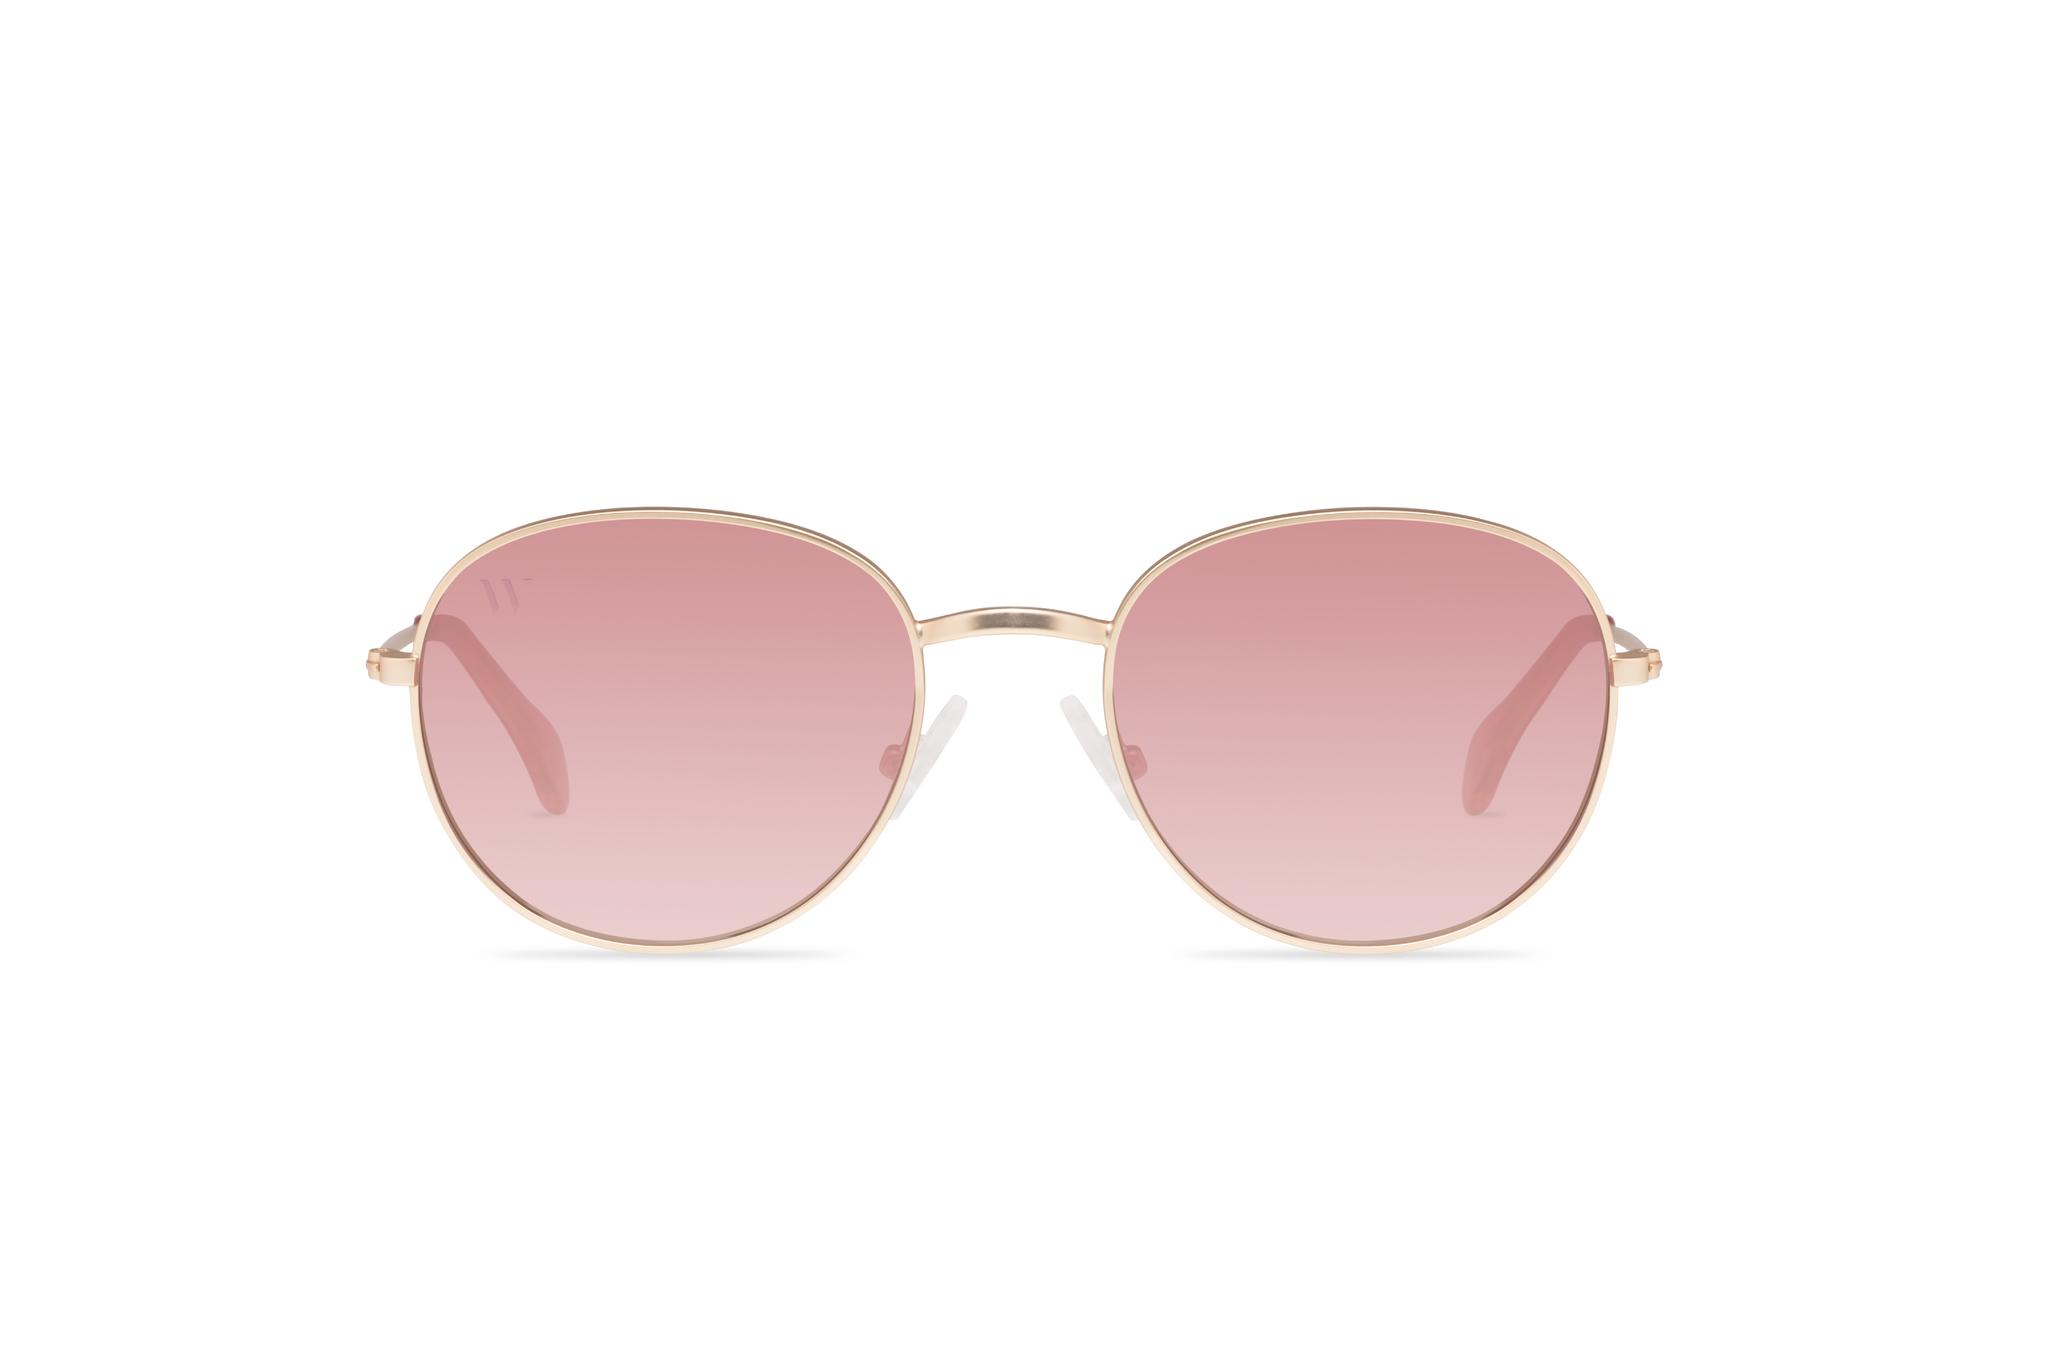 Gafas de sol WOLFNOIR (35 EUROS)